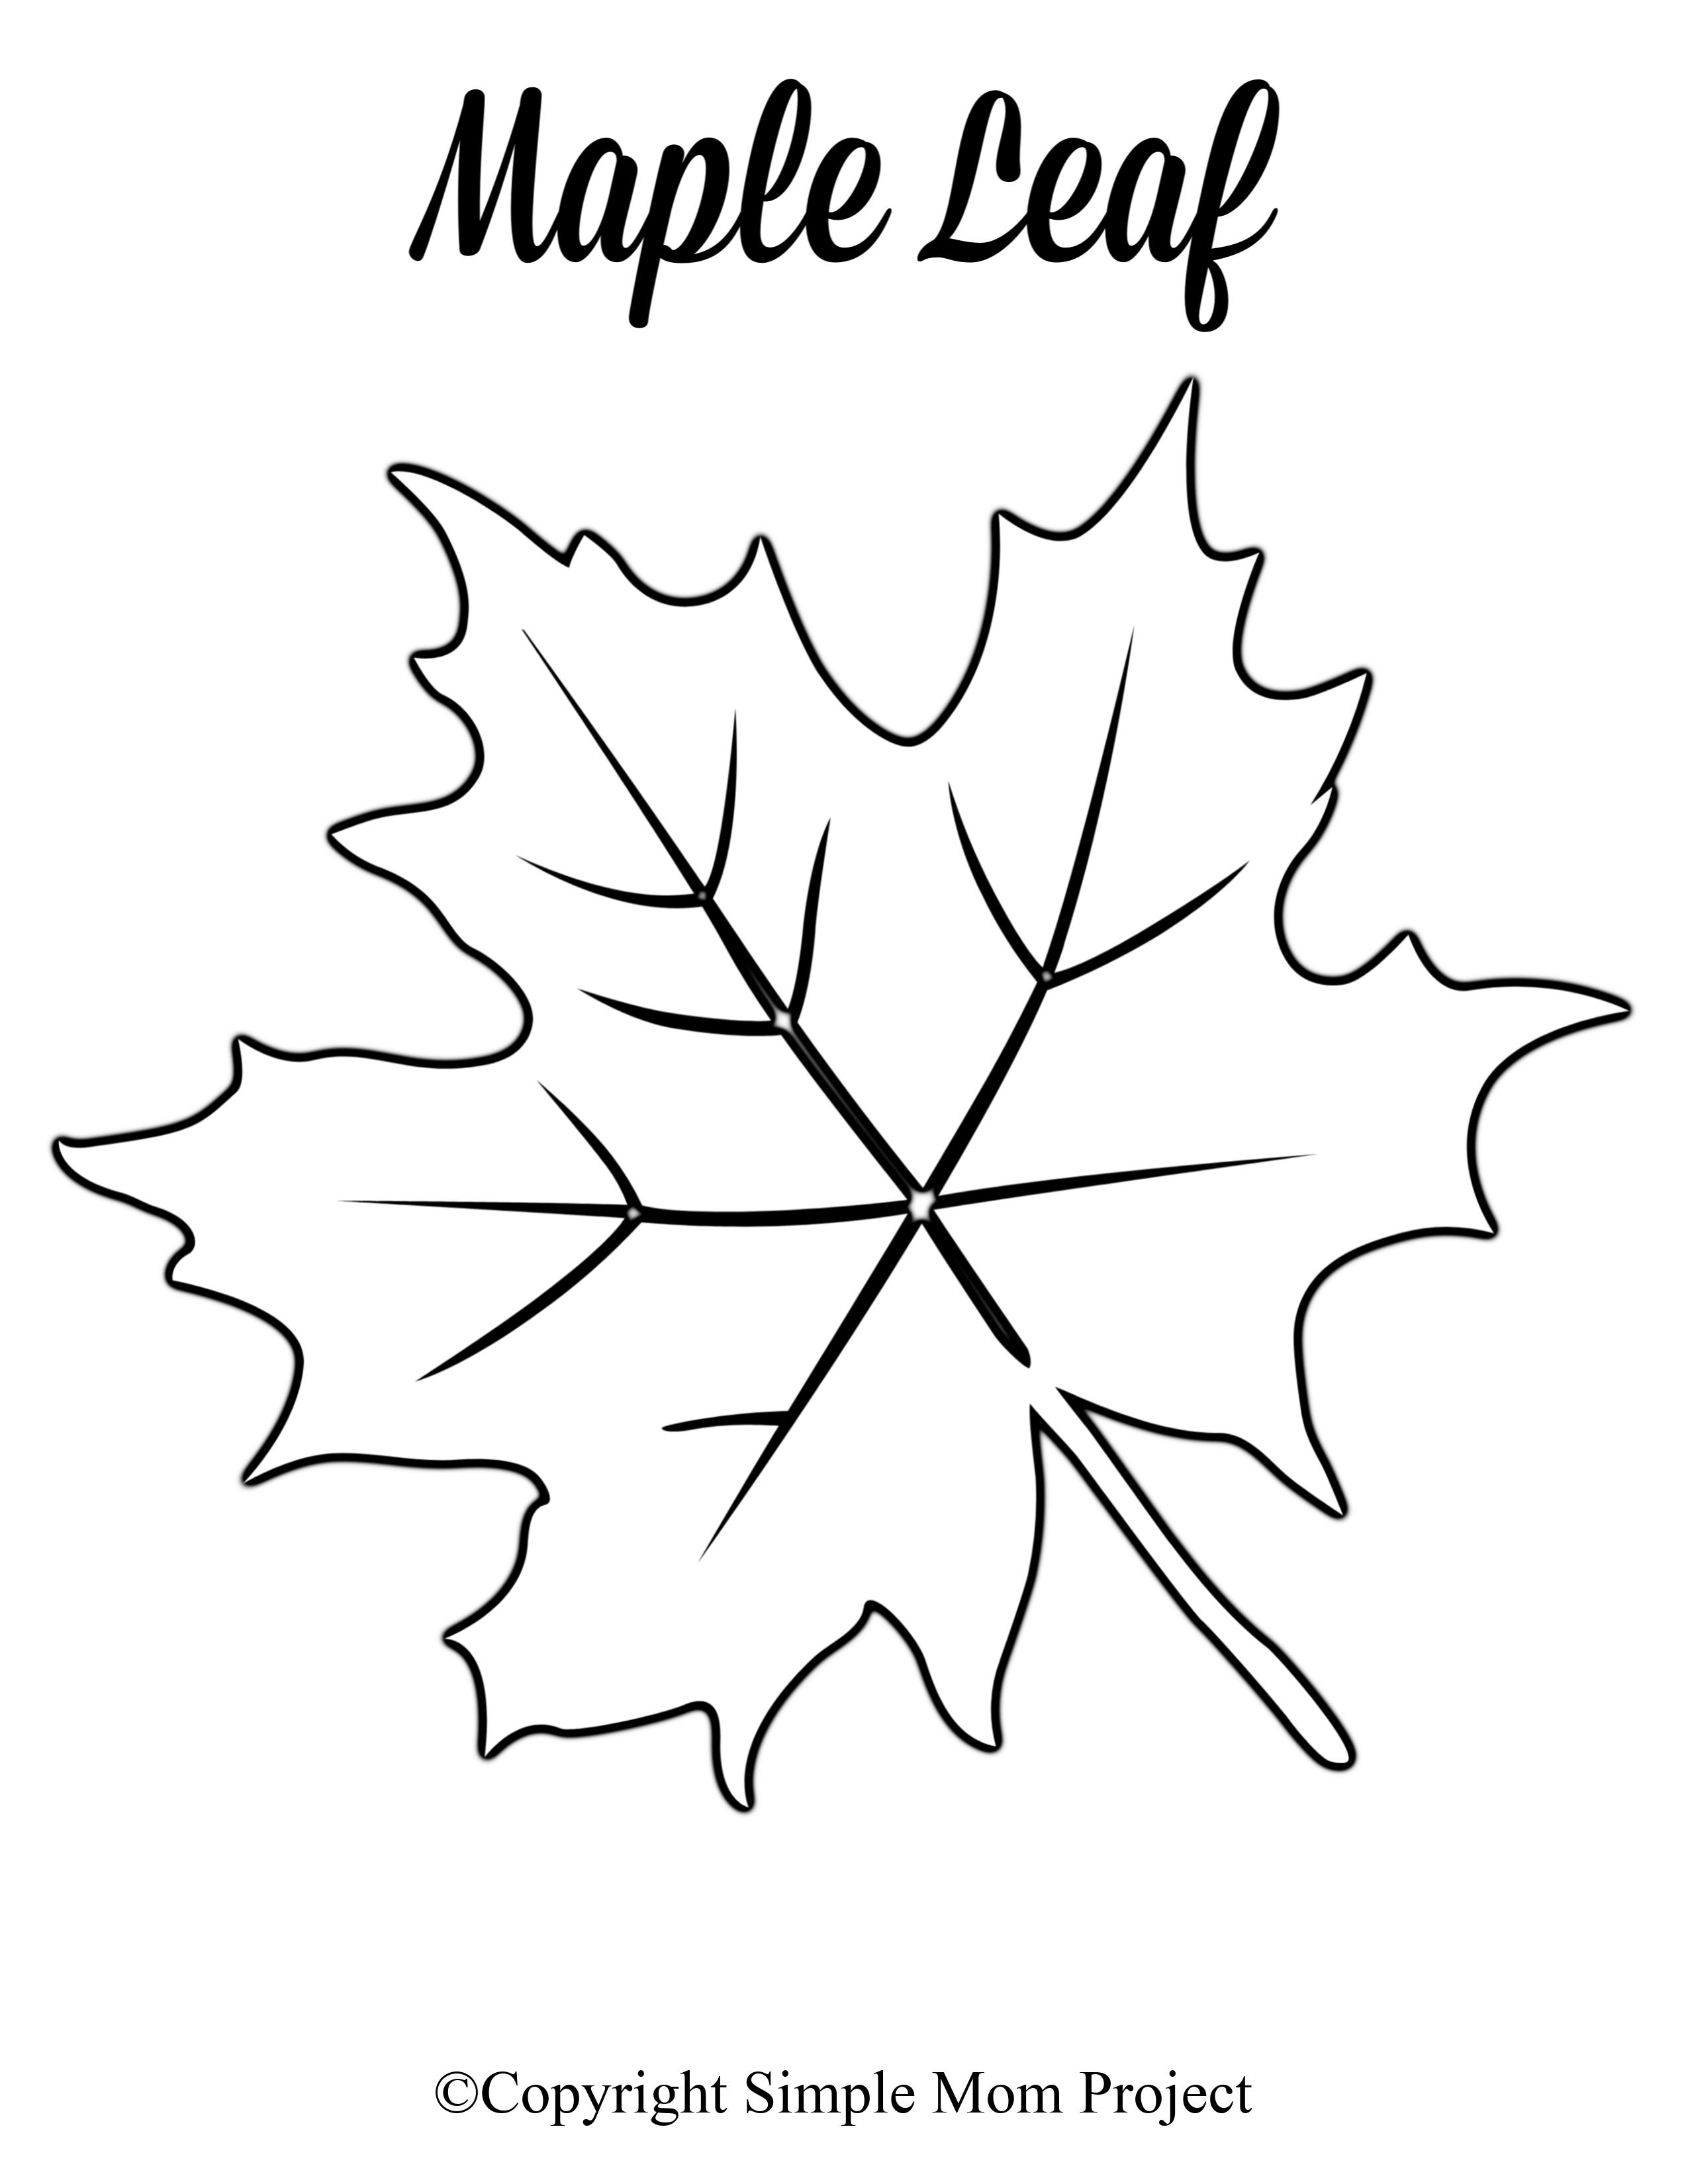 79 Leaf Coloring Pages Ideas Leaf Coloring Page Leaf Coloring Printable Leaves